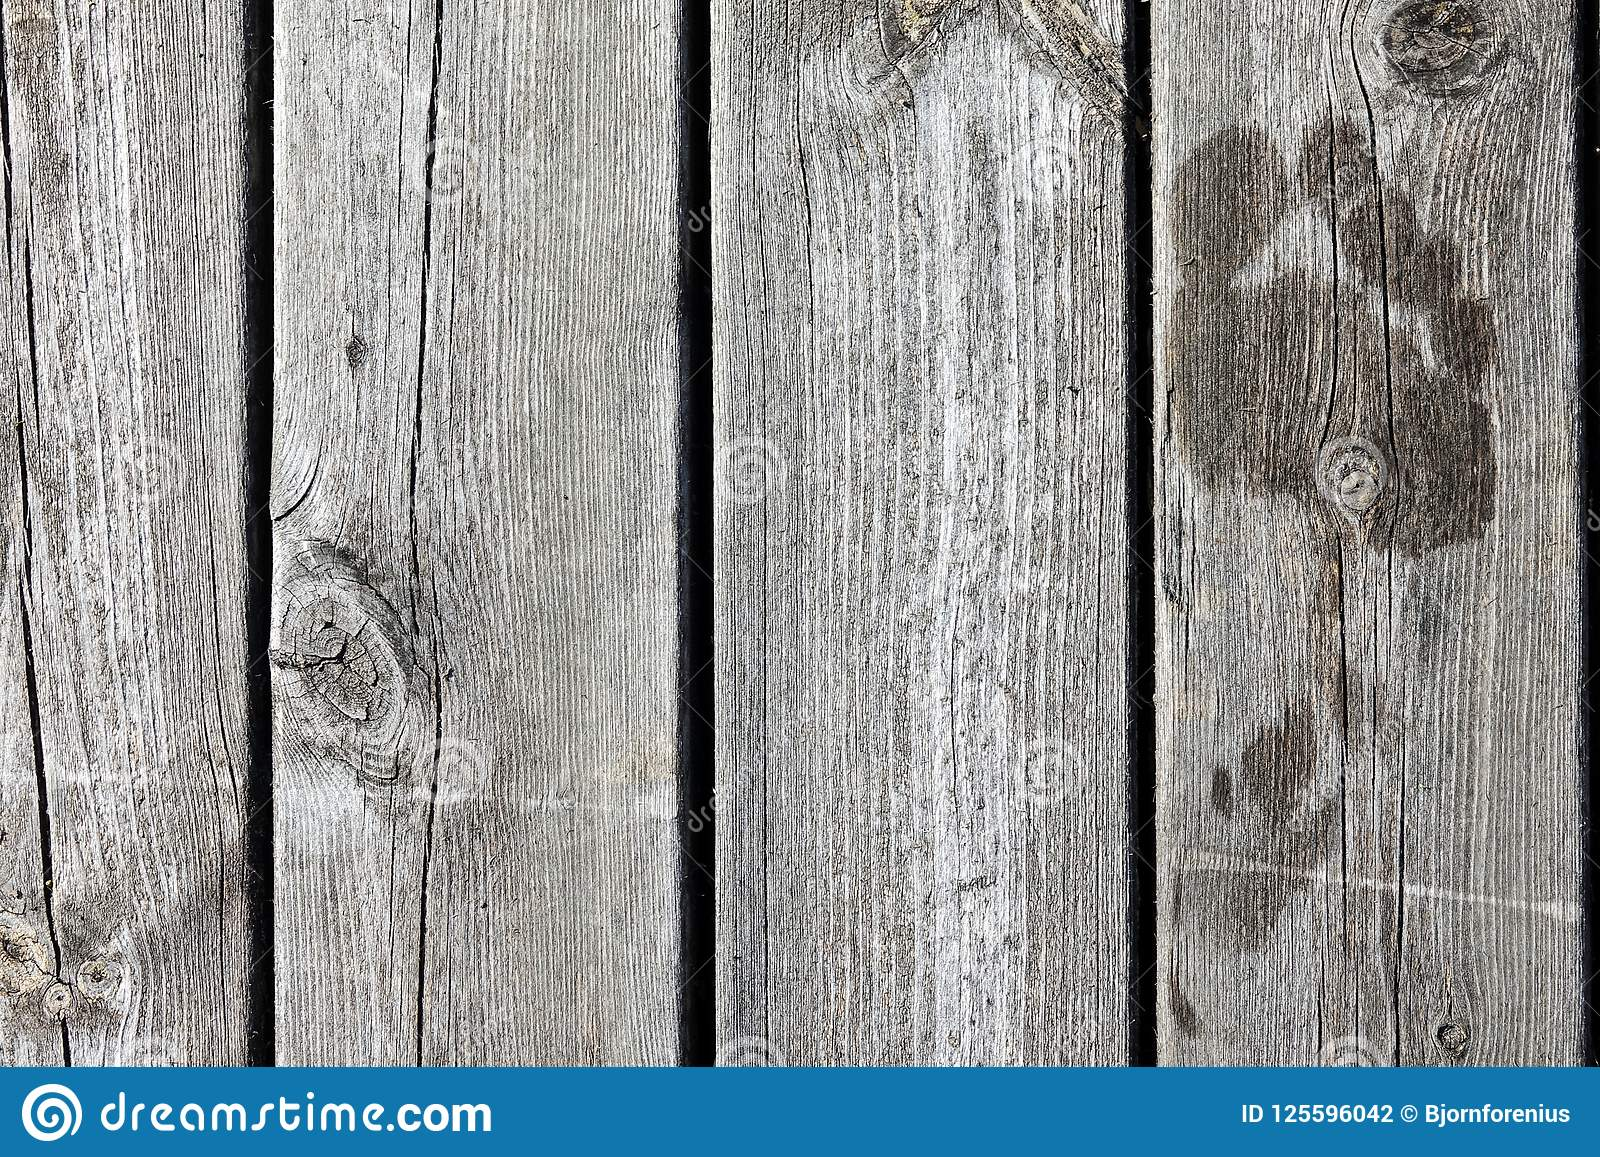 Wet Footprints On A Wooden Jetty / Bridge. Stock Photo - Image of ...